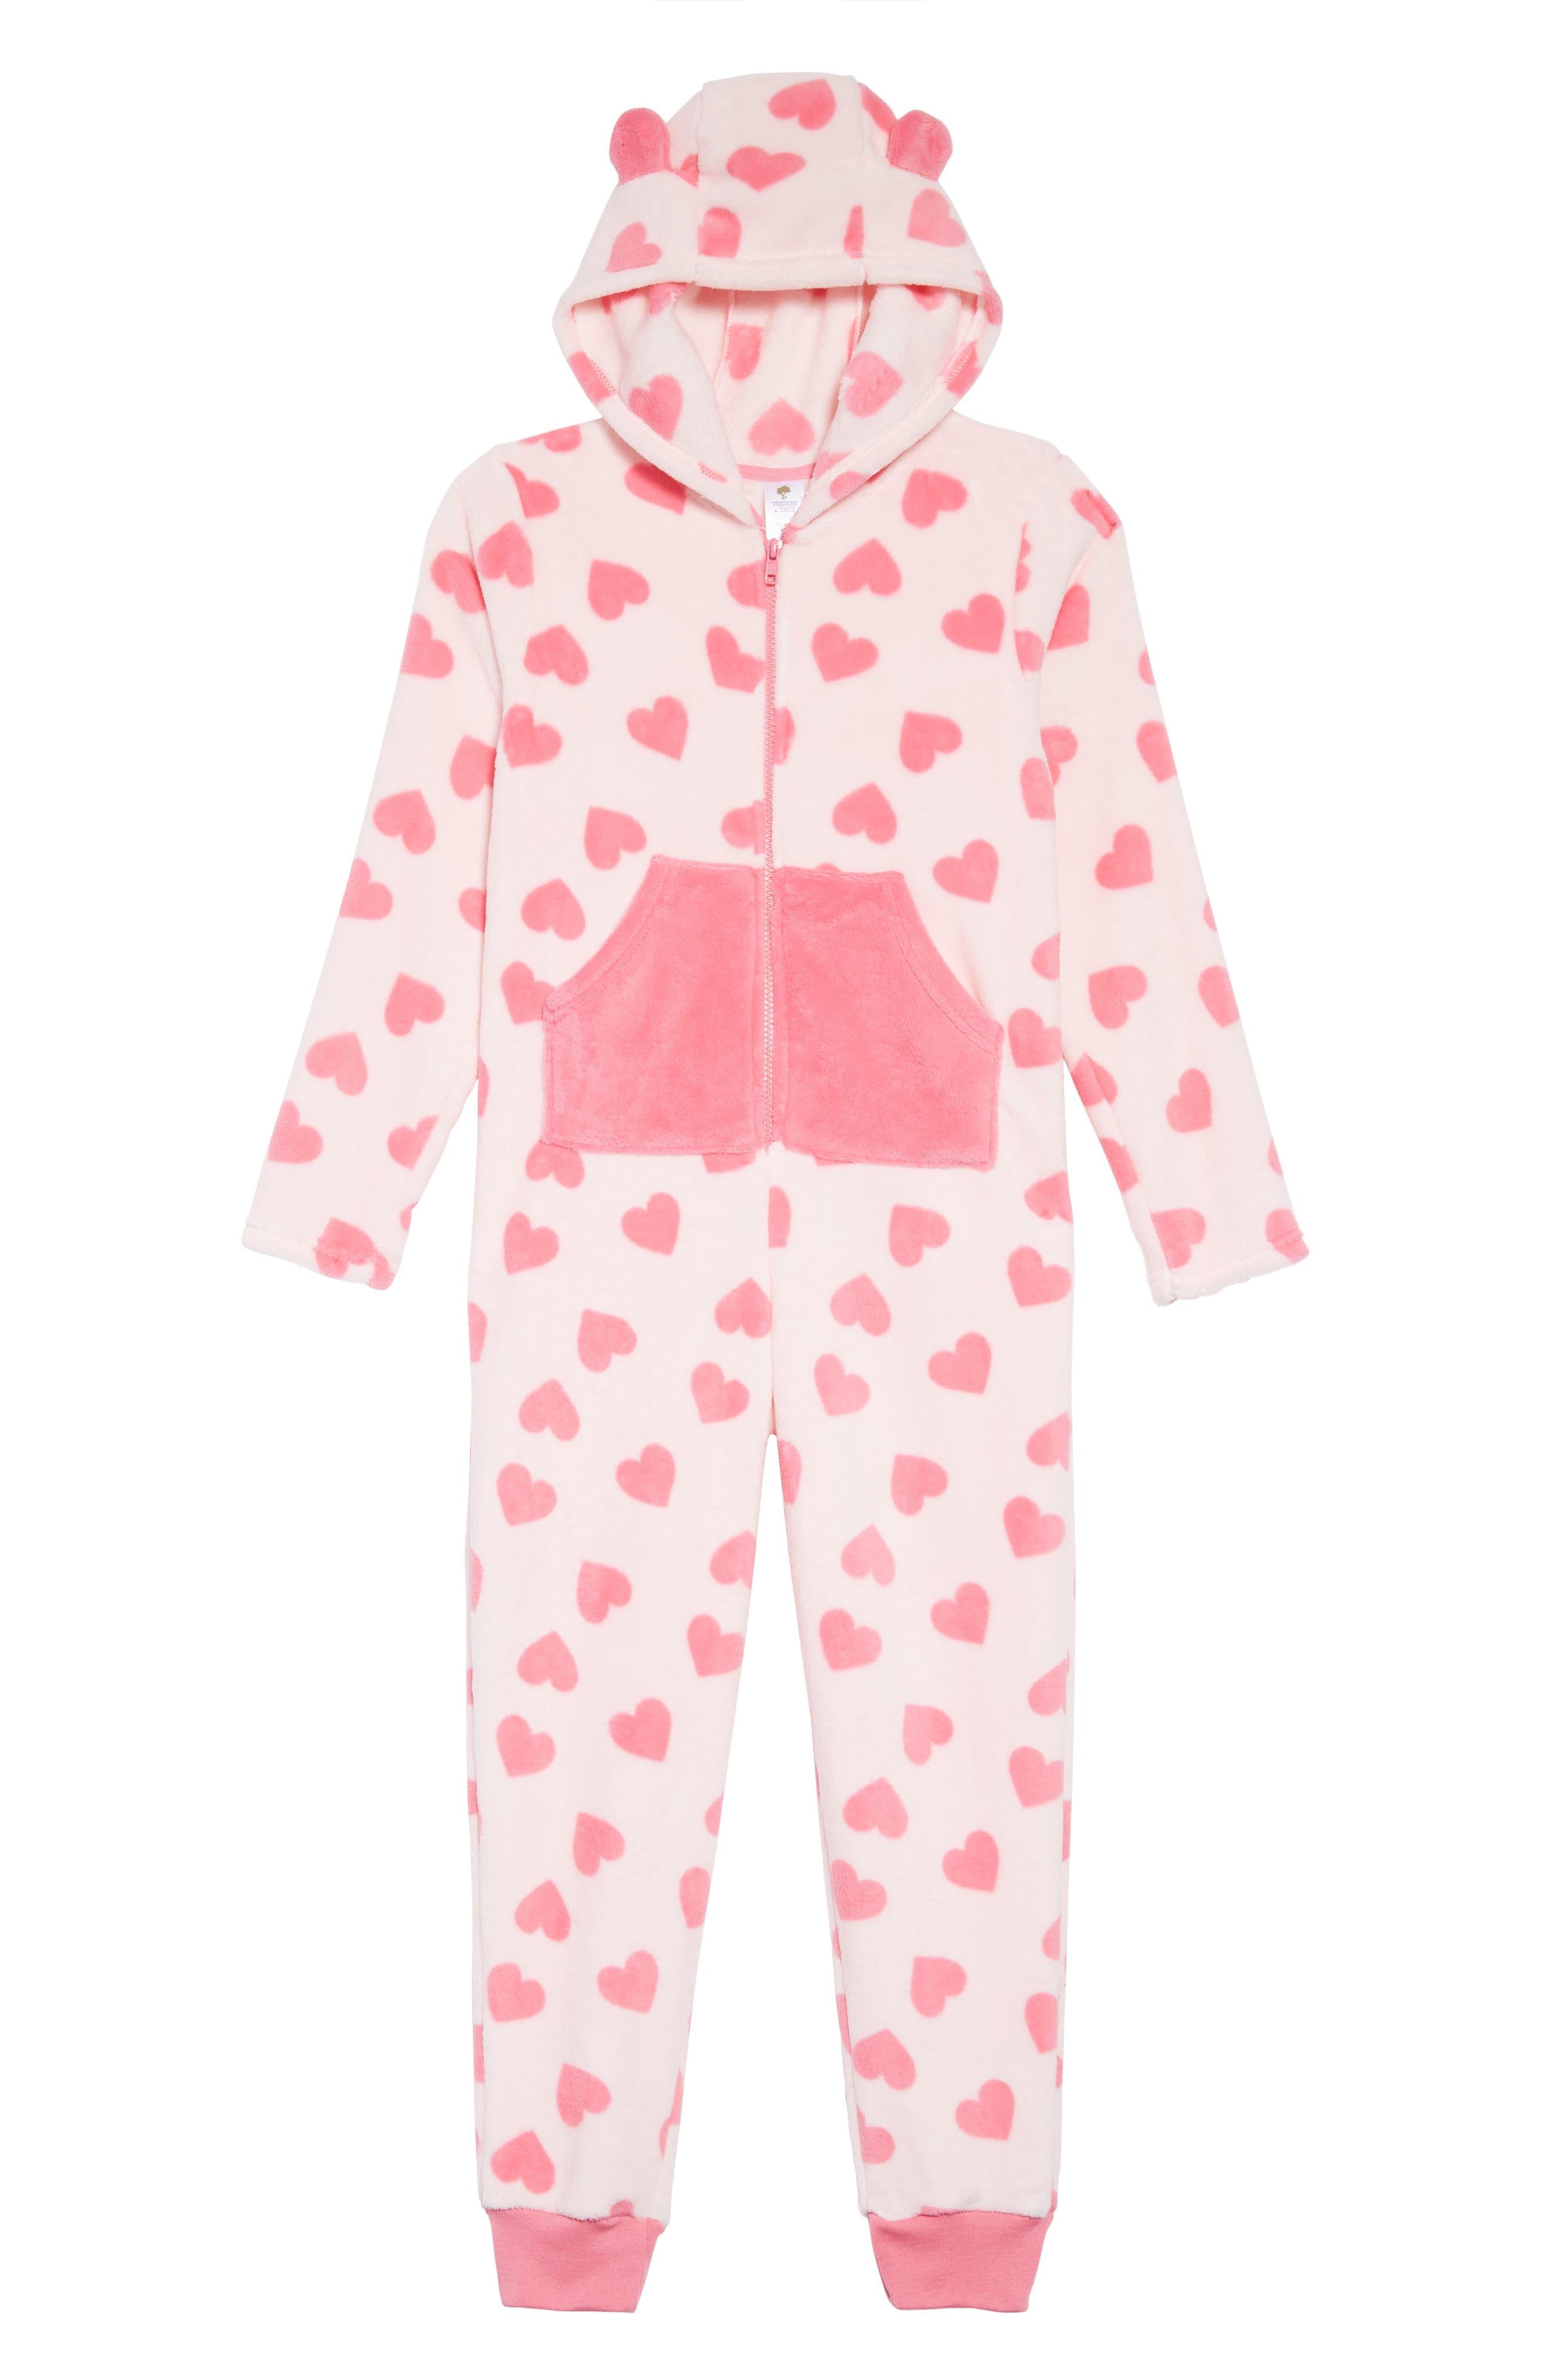 One-Piece Pajamas,                             Main thumbnail 1, color,                             680